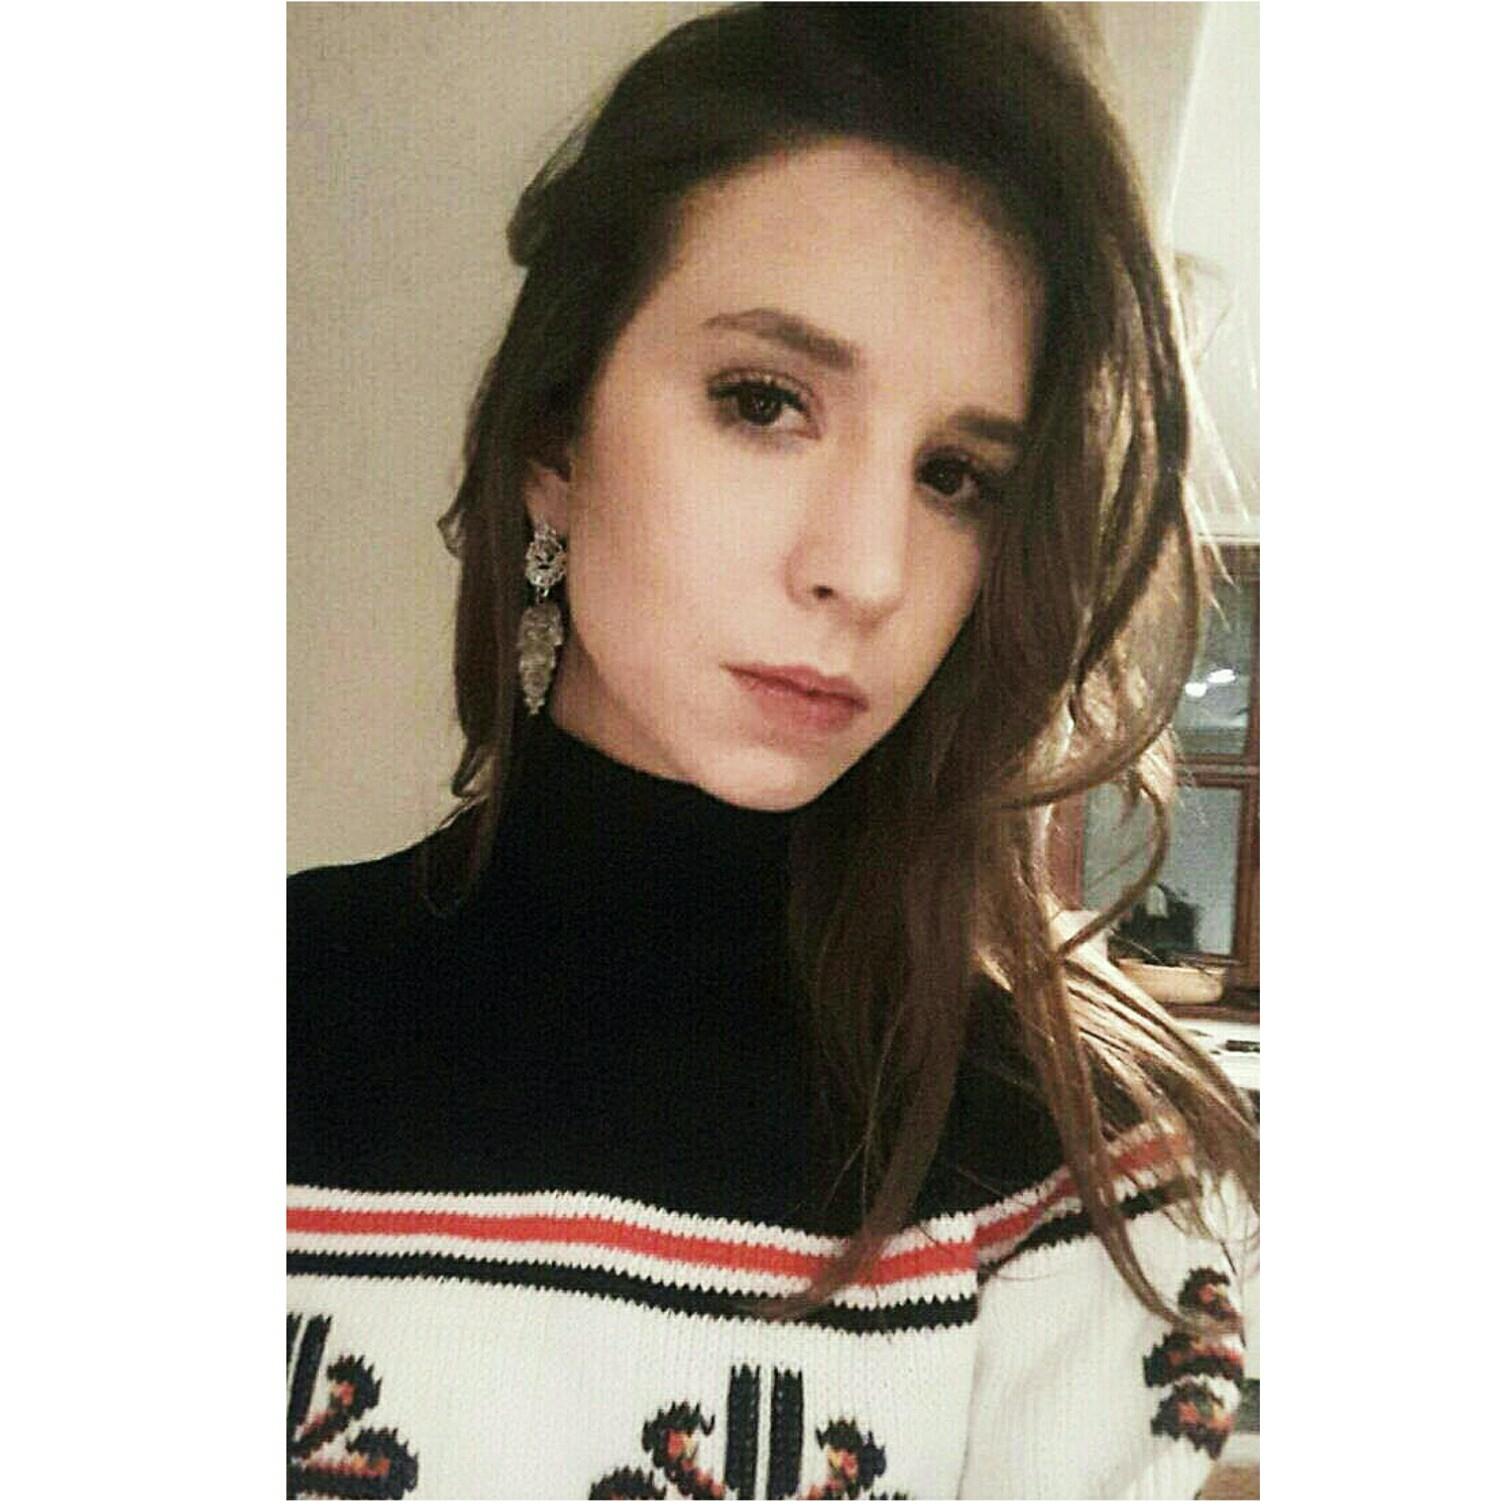 Julia Podobas